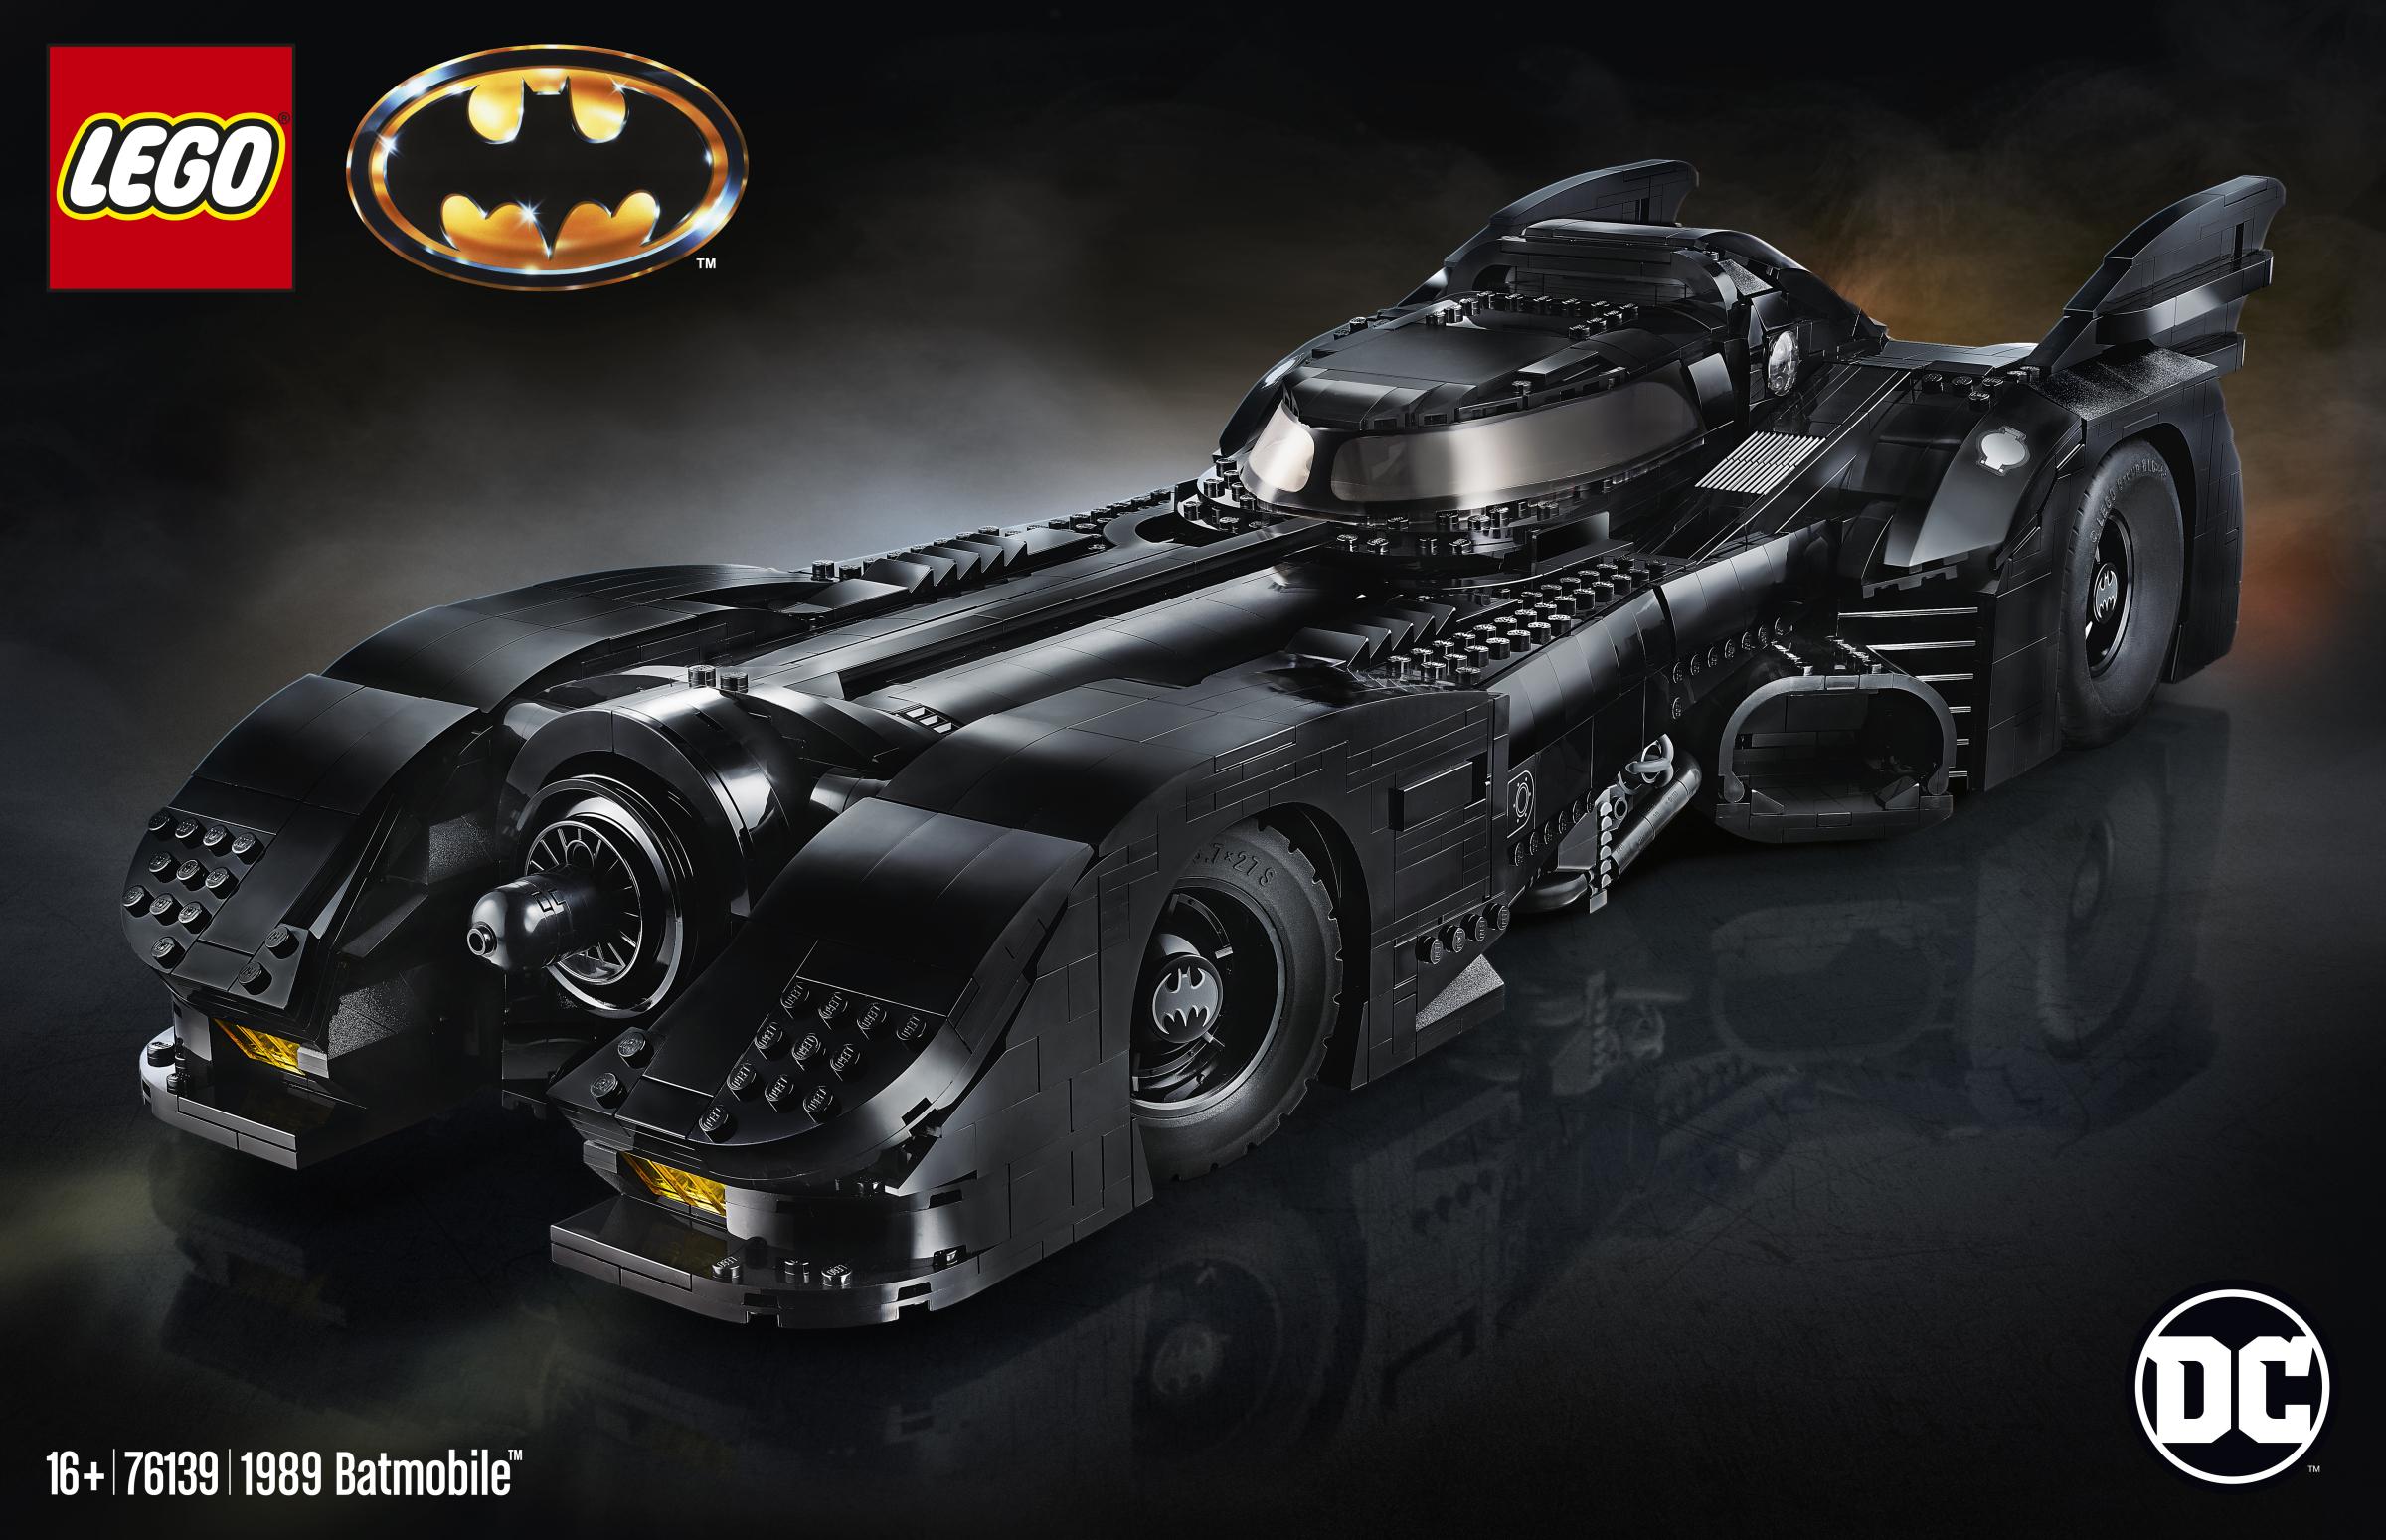 76139 1989 Batmobile box